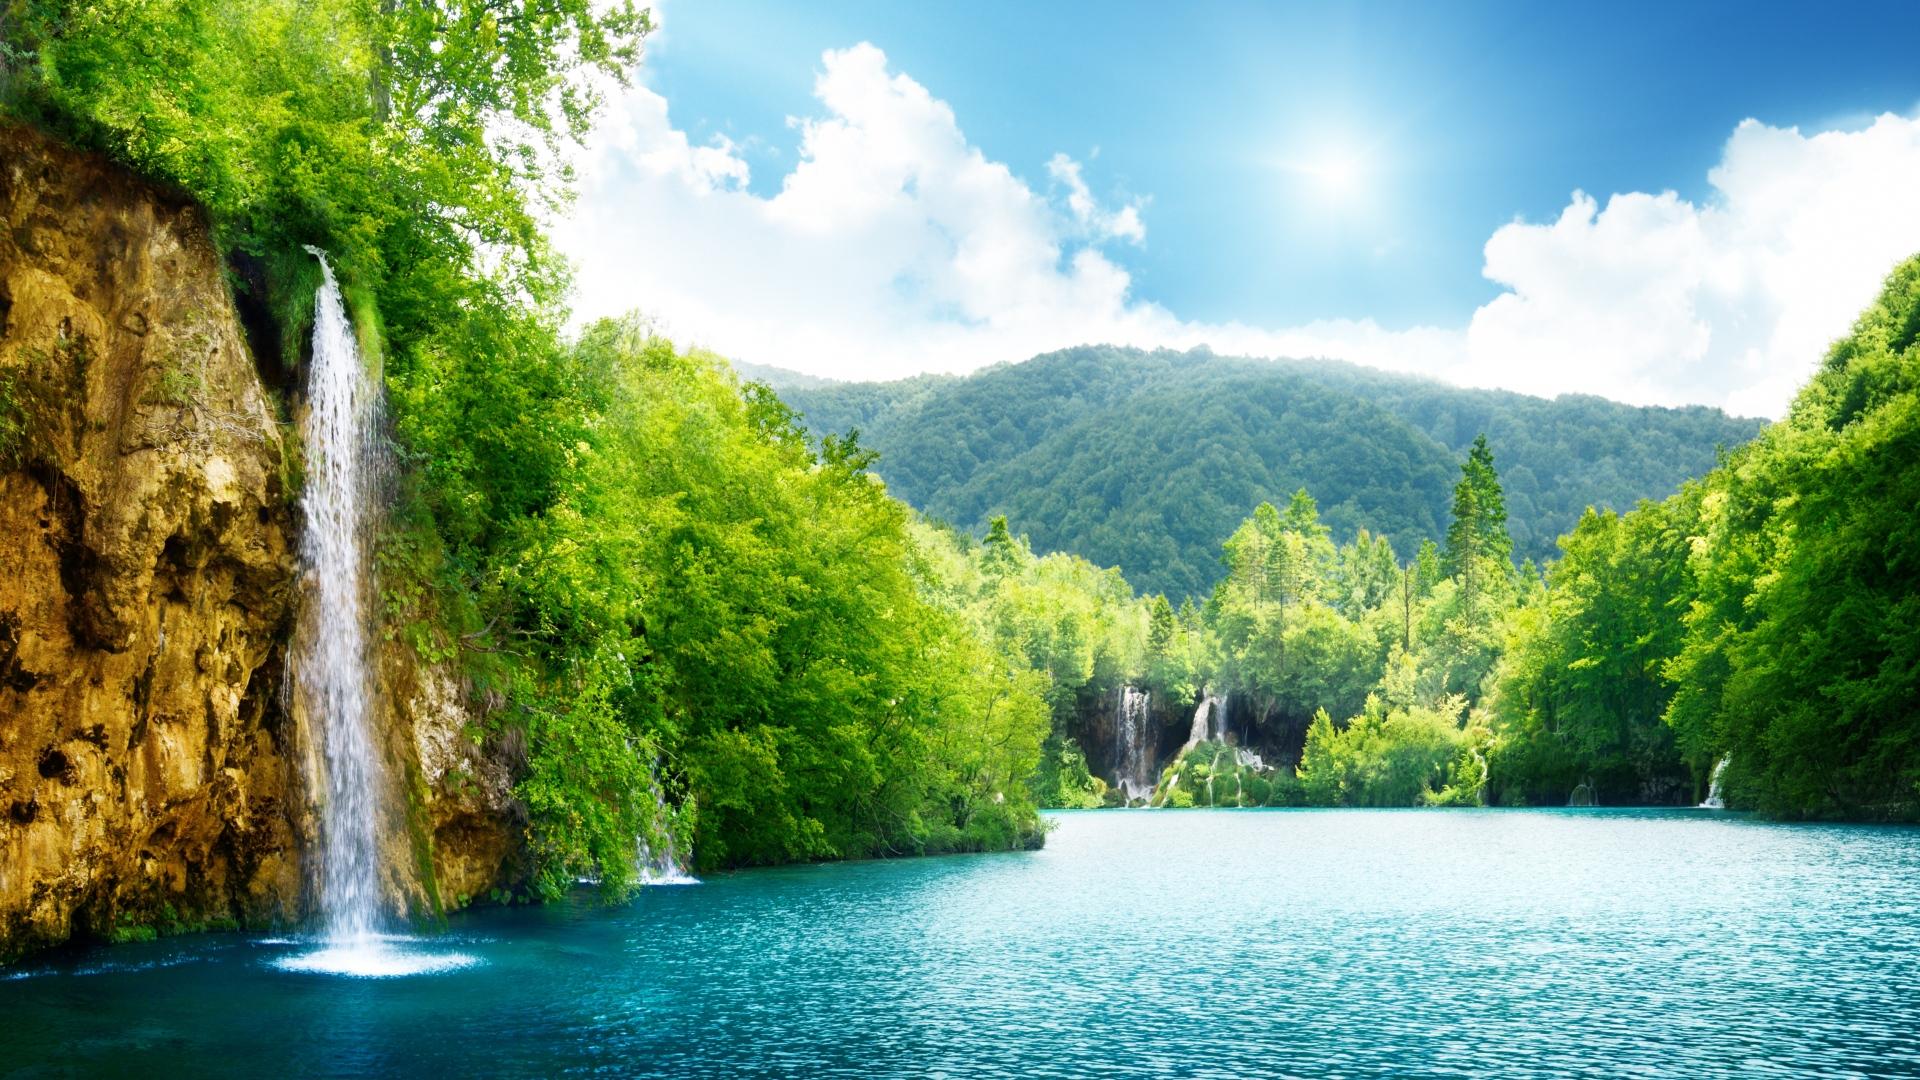 hd nature wallpaper 1080p - sf wallpaper